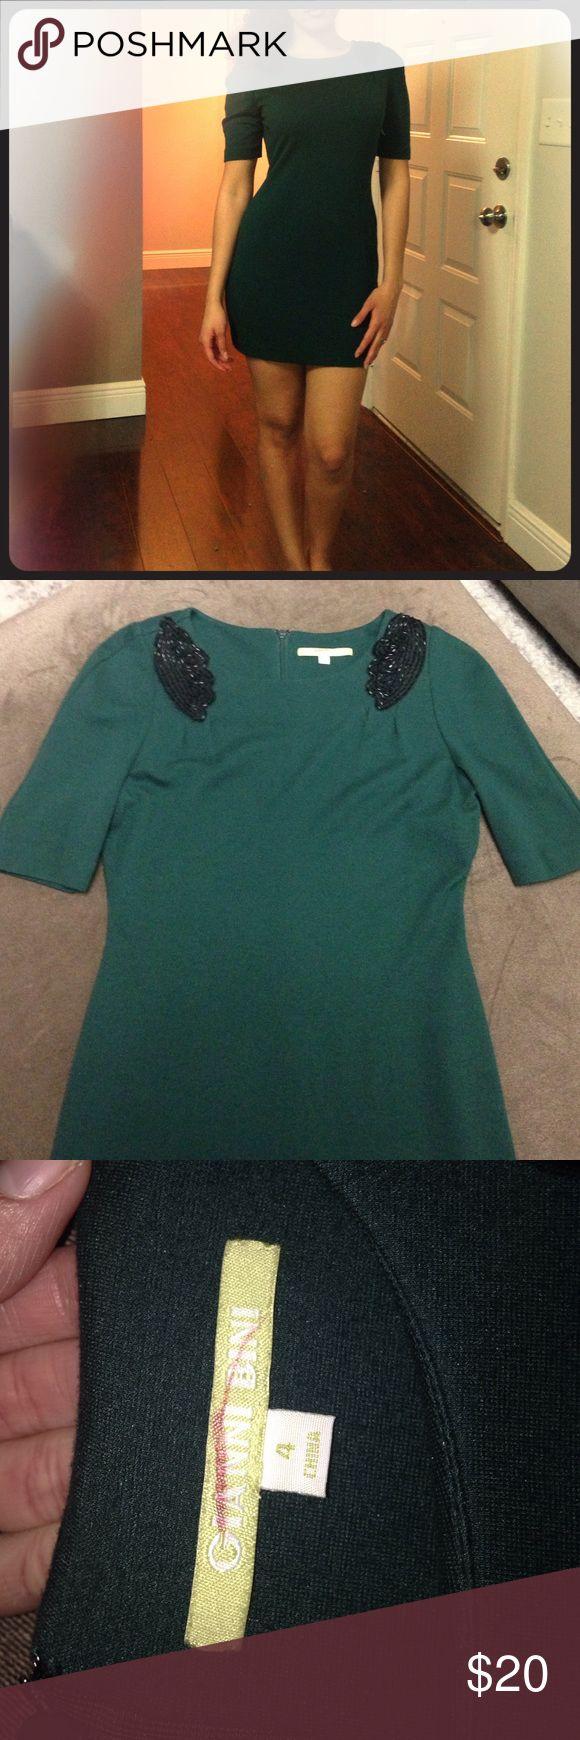 Gianni Bini green dress Gianni Bini gorgeous cocktail dress. Dark green with black beading on shoulders. Size 4 Gianni Bini Dresses Mini